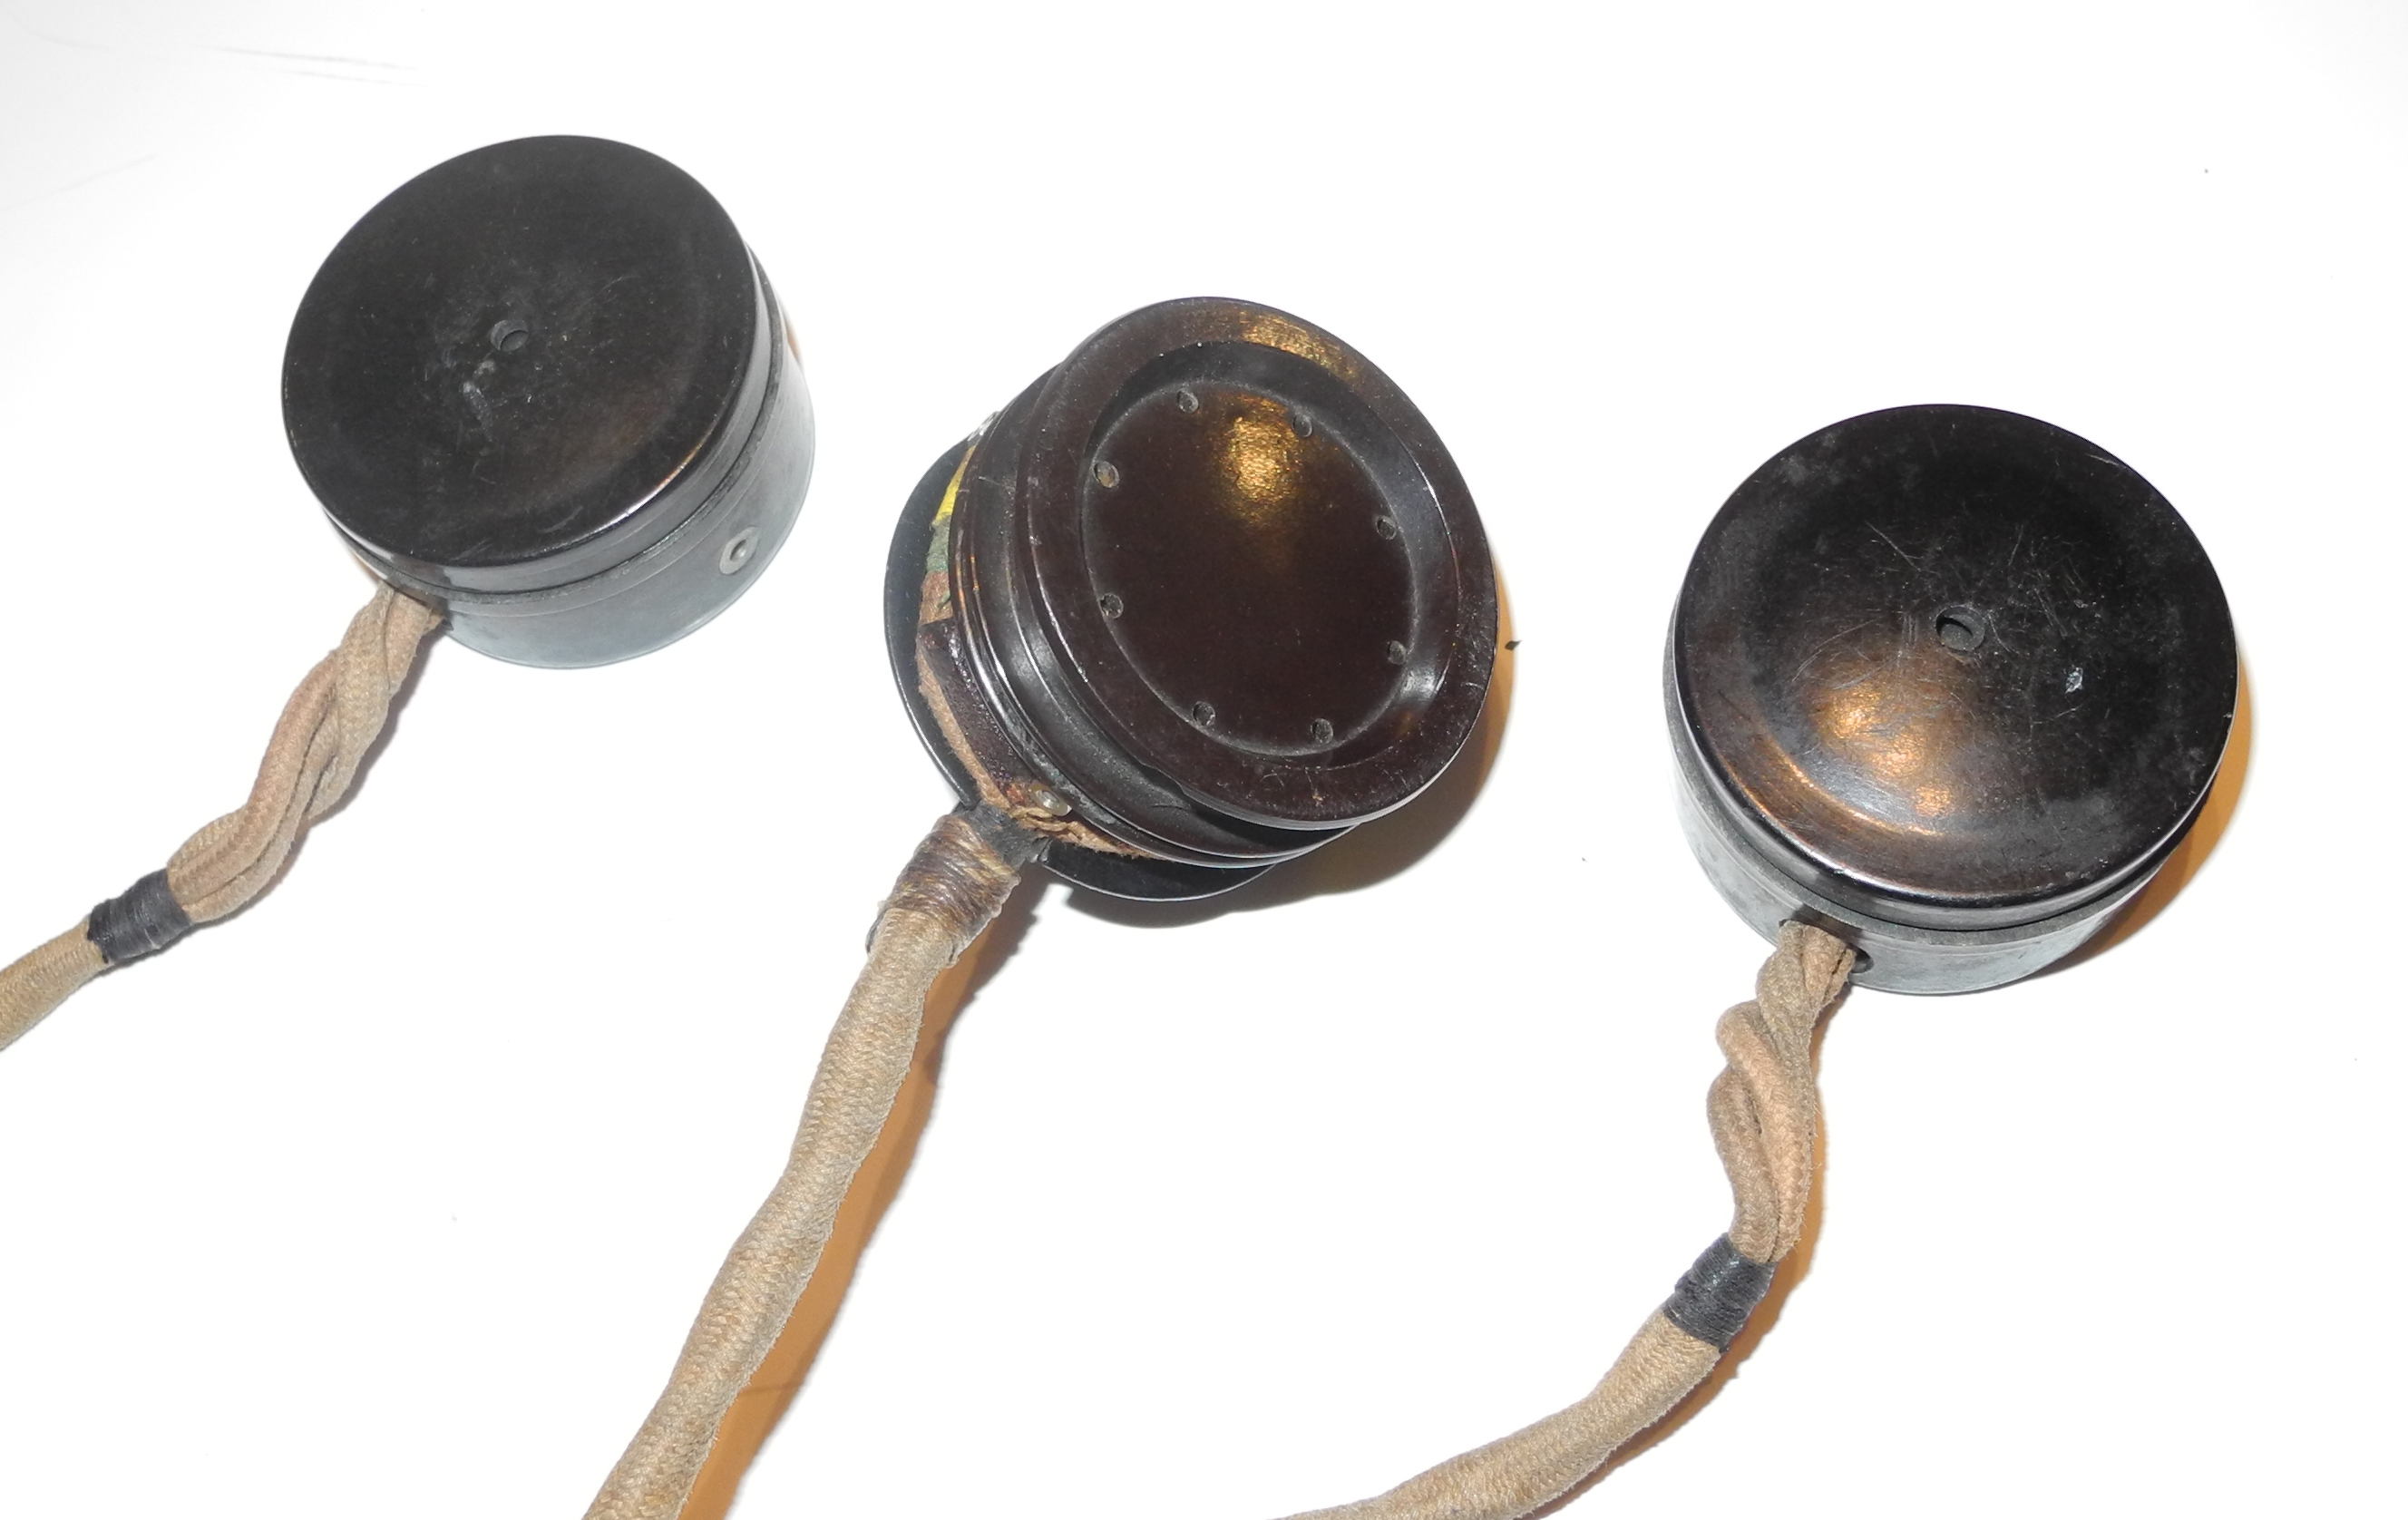 RAF early tan wiring loom